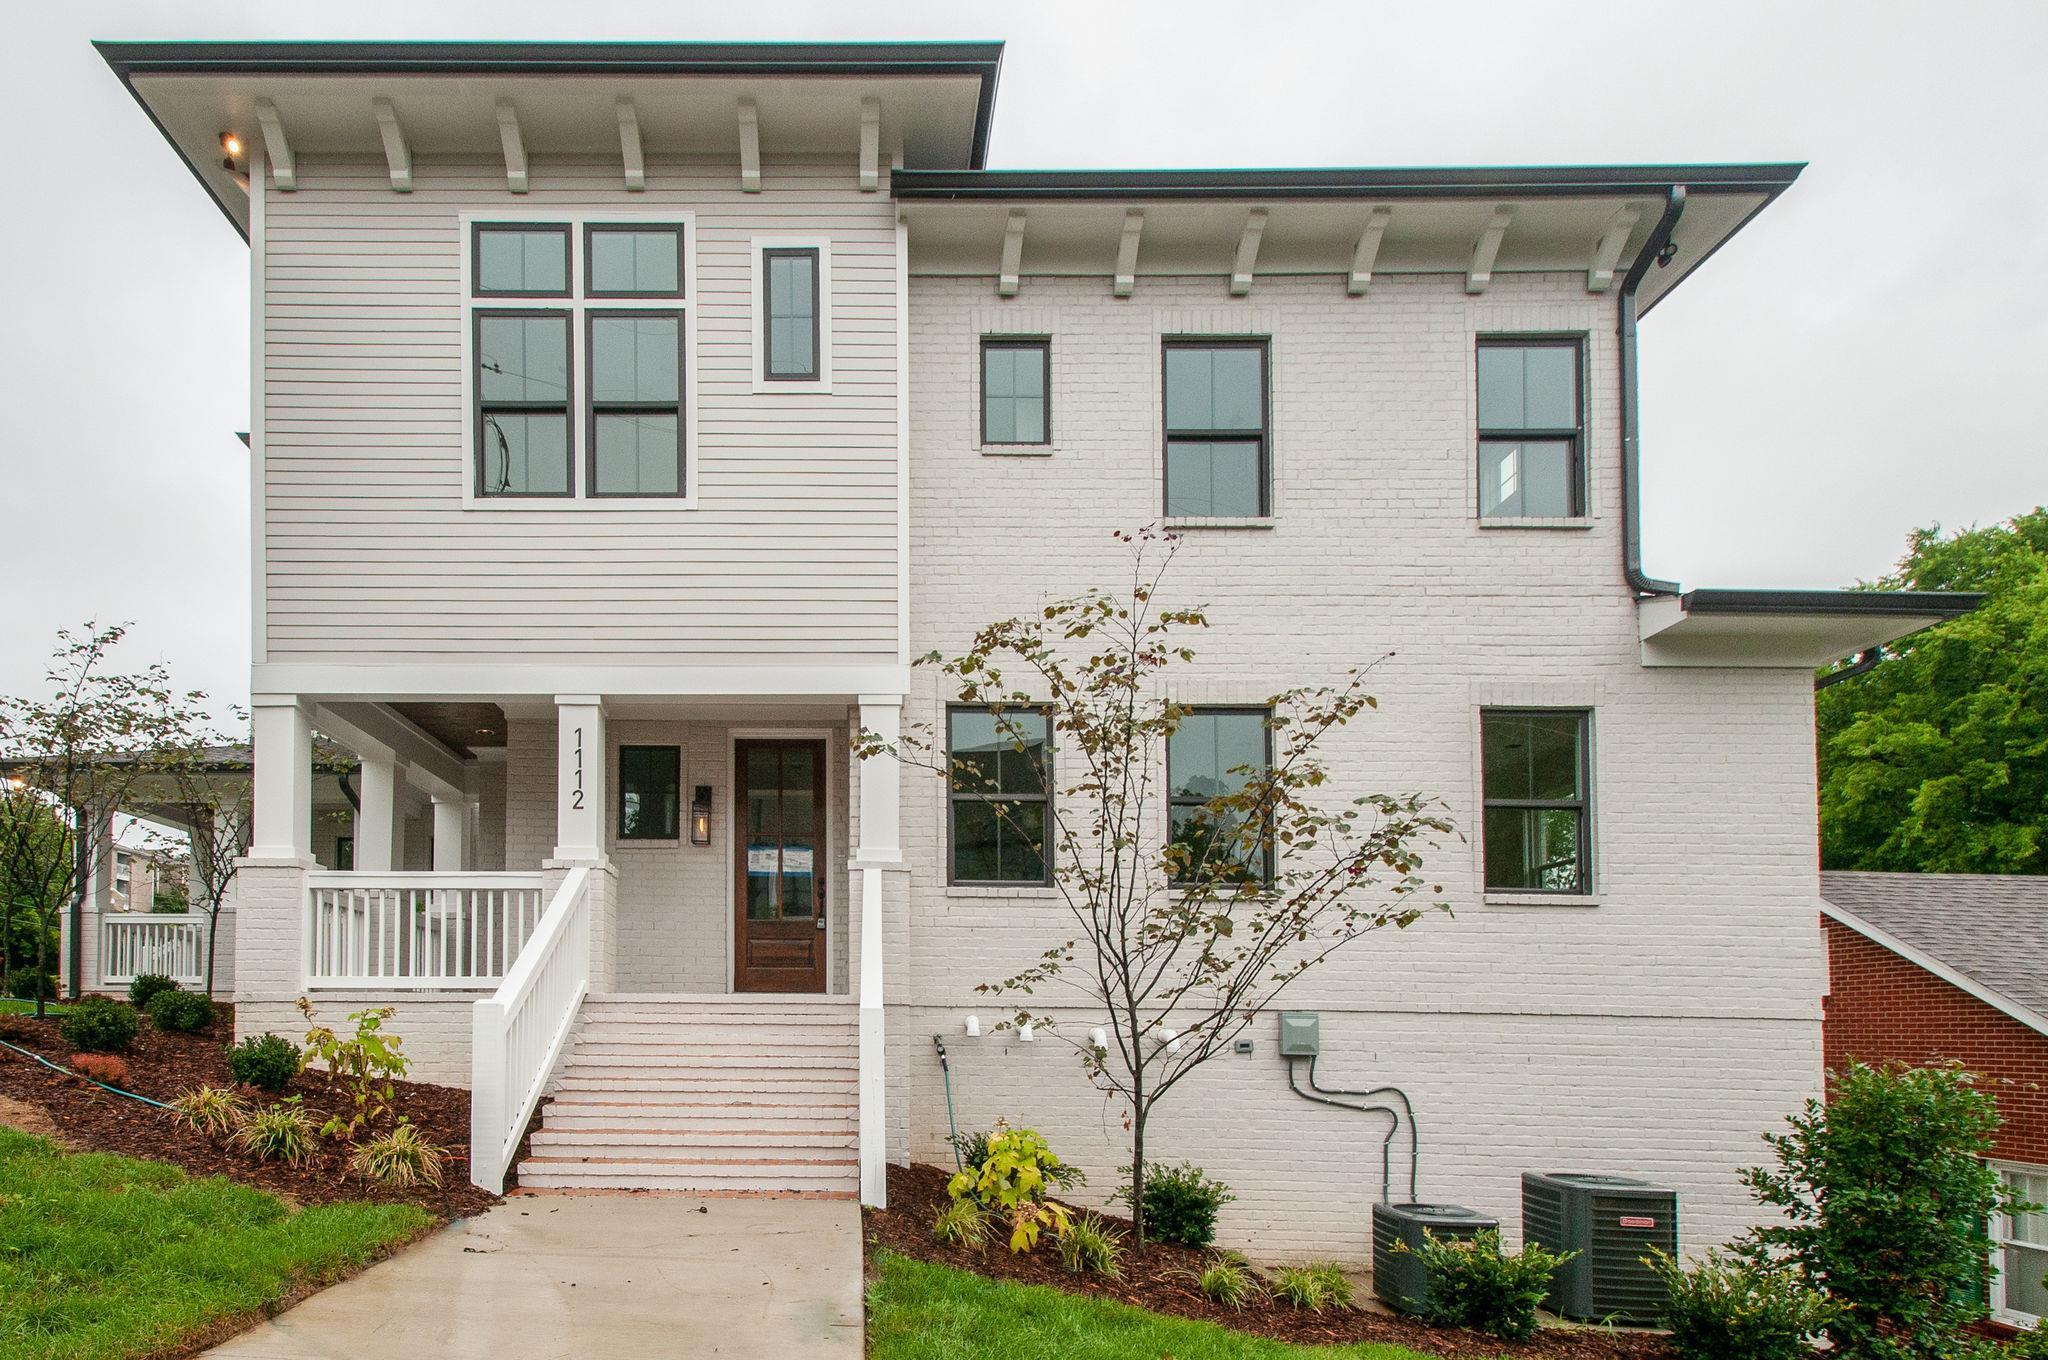 1112 S Douglas Ave, Nashville, TN 37204 - Nashville, TN real estate listing